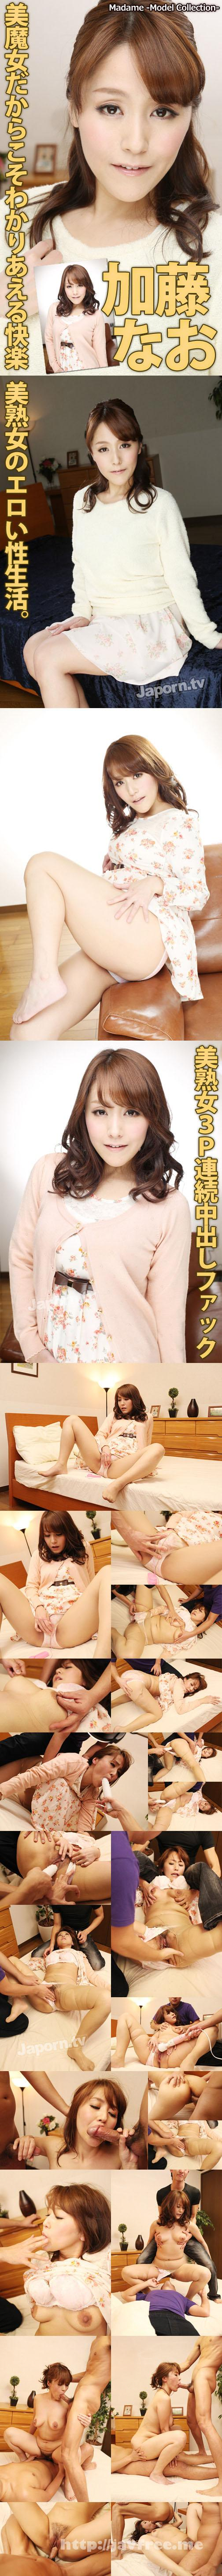 [BT 125] Madame  Model Collection  : 加藤なお 加藤なお Nao Kato BT